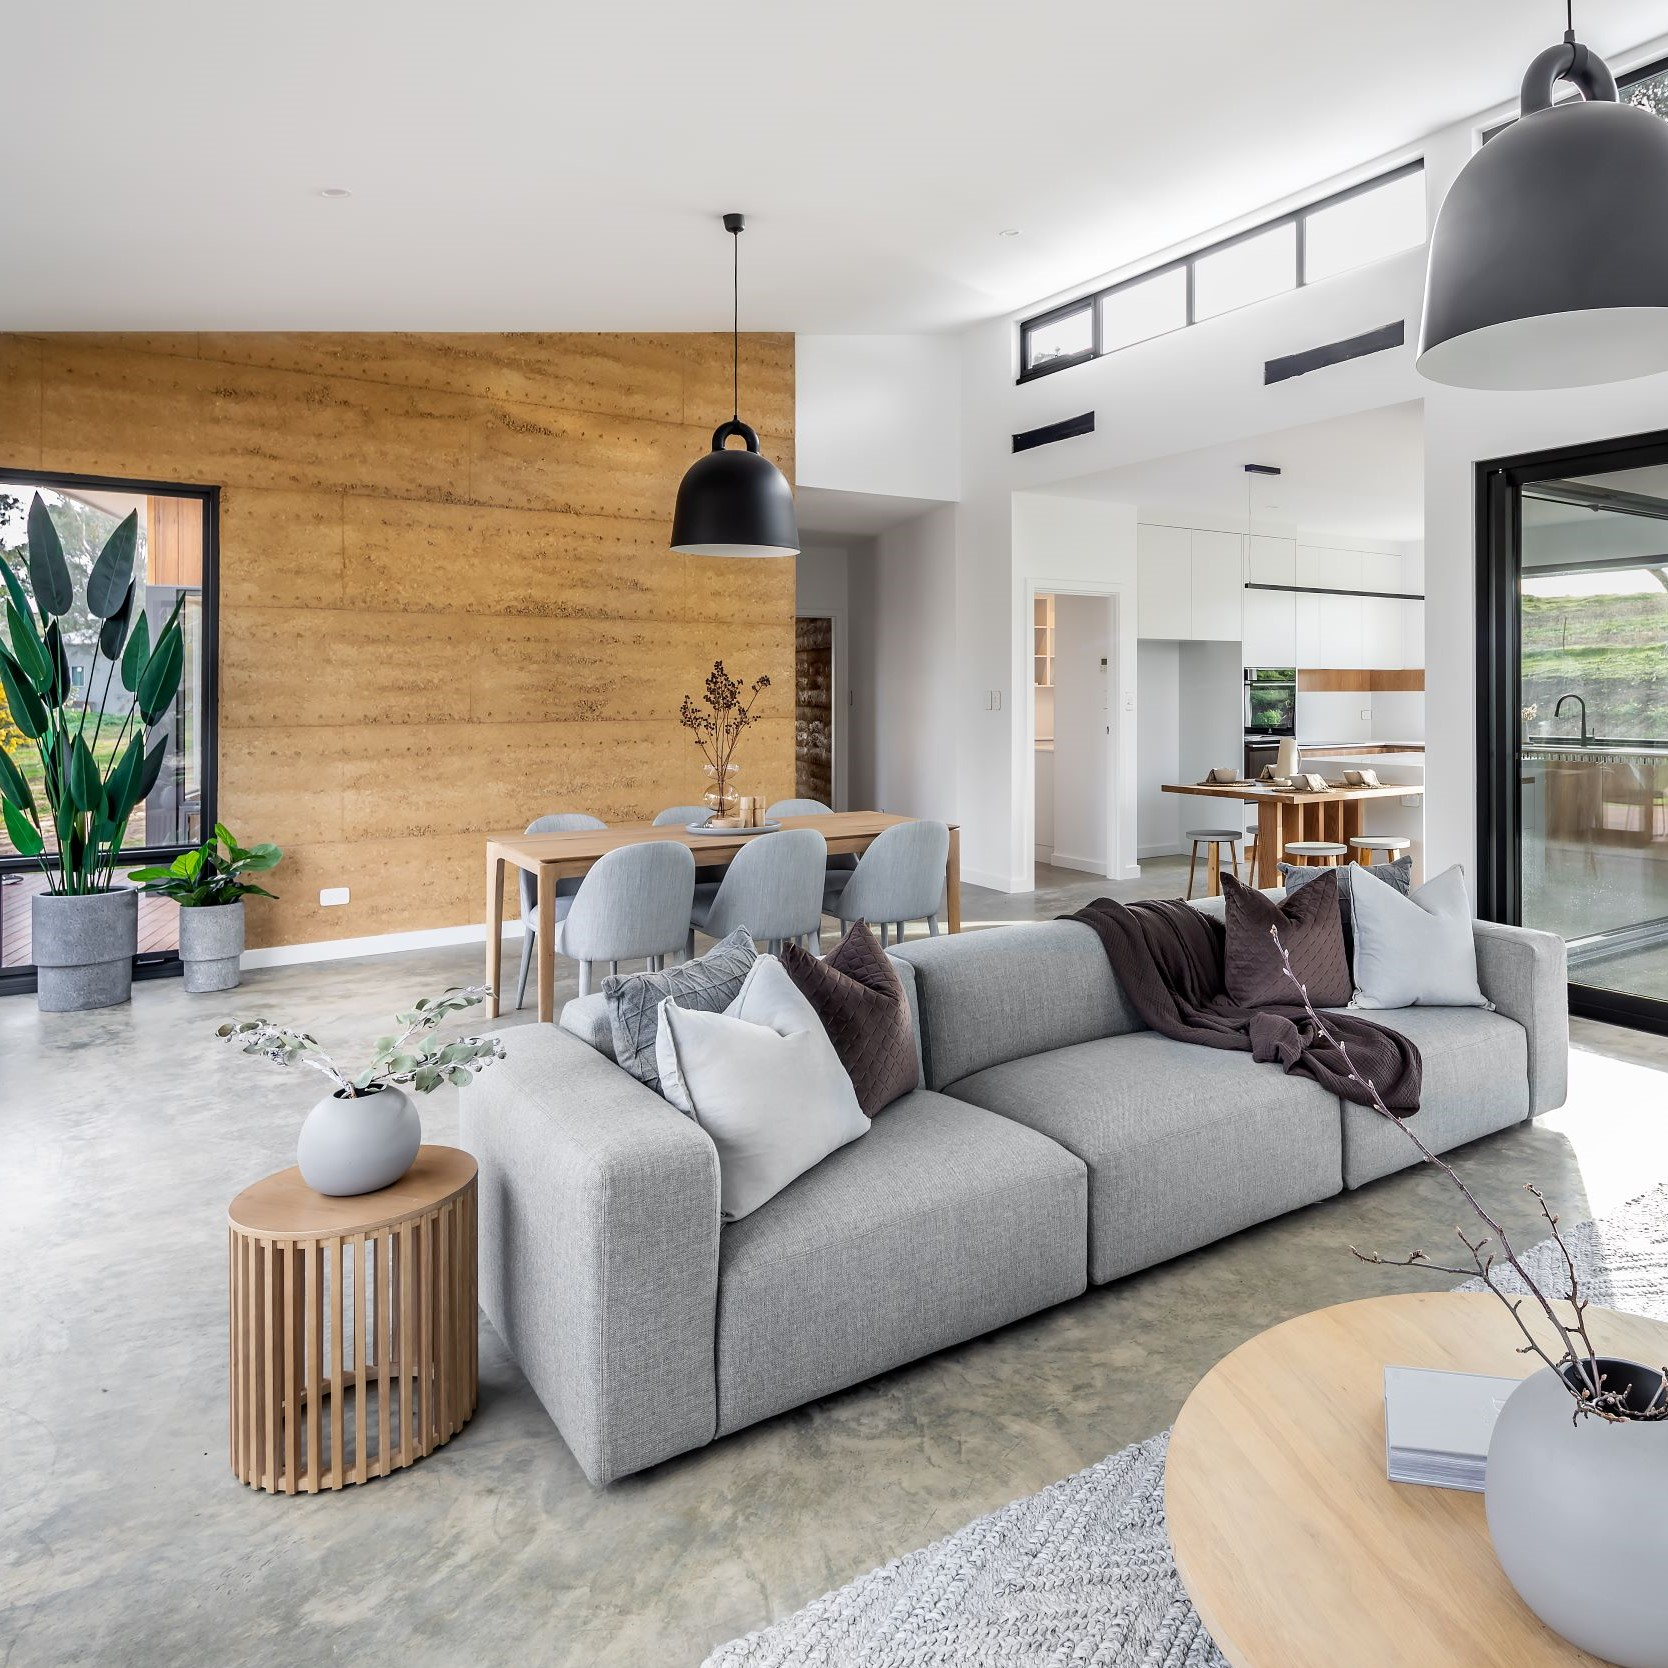 aaron-martin-constructions-dawson-street-project-living-room